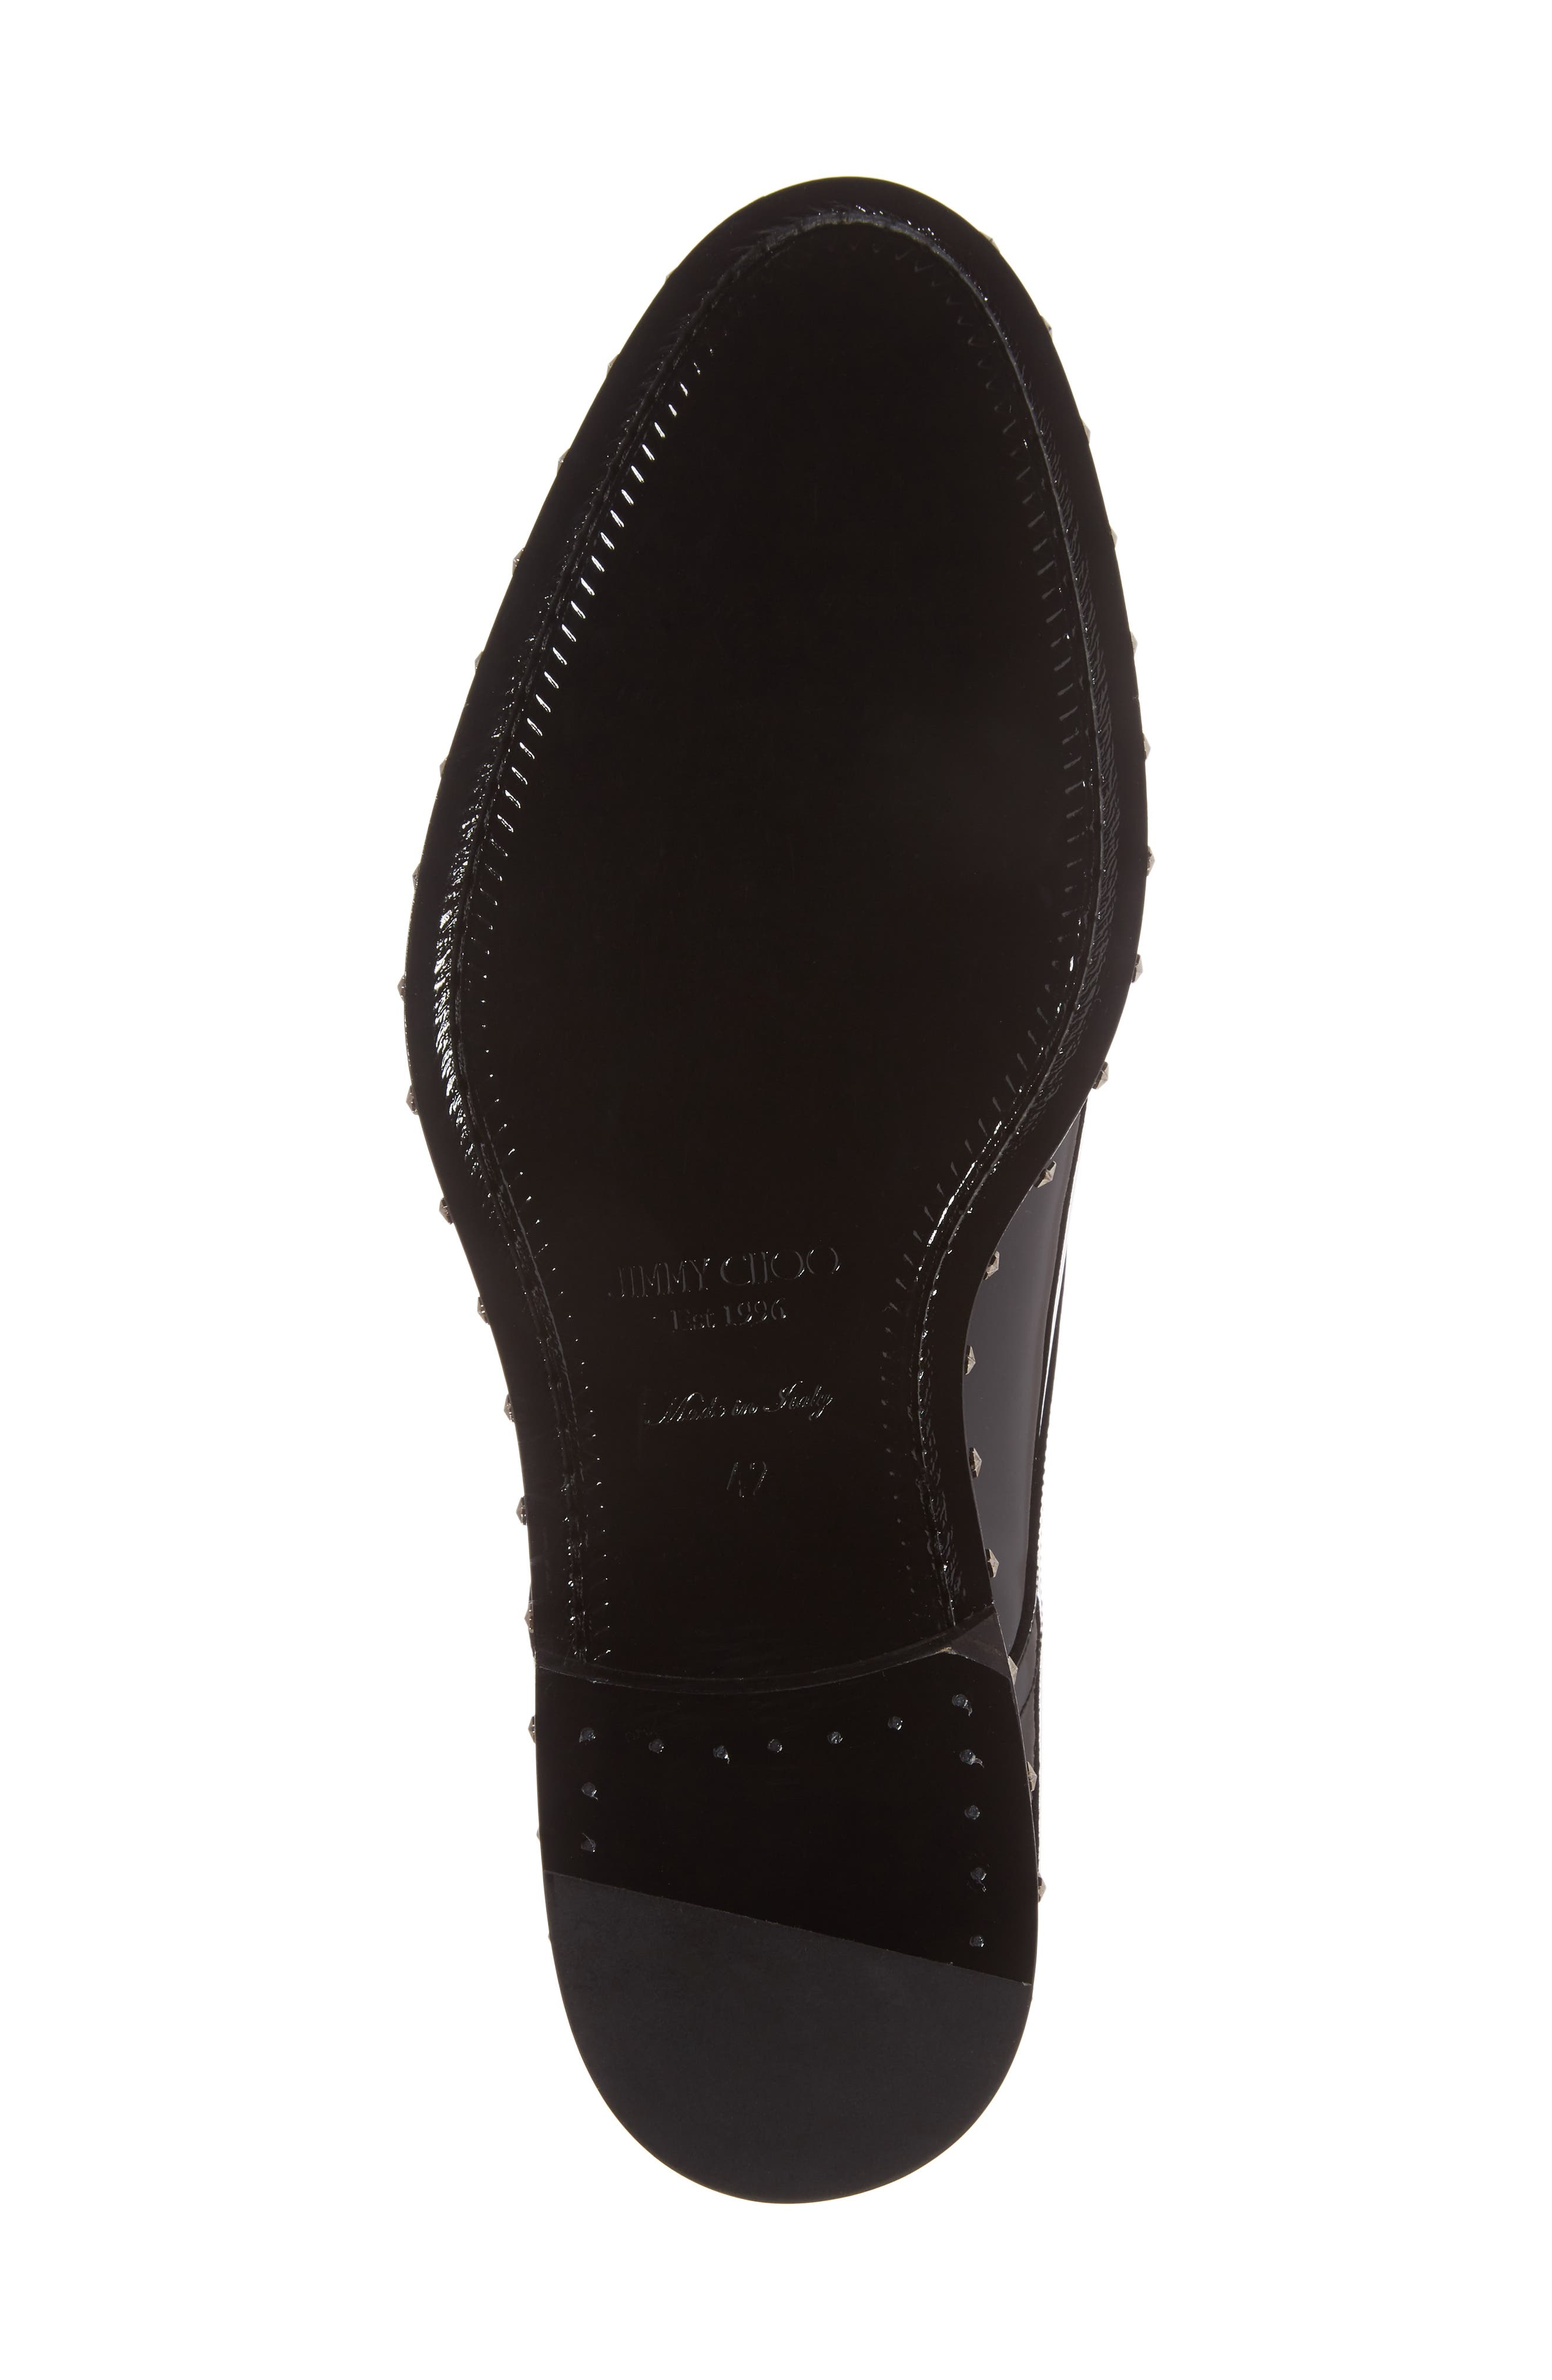 Studded Plain Toe Derby,                             Alternate thumbnail 6, color,                             Black Patent Leather